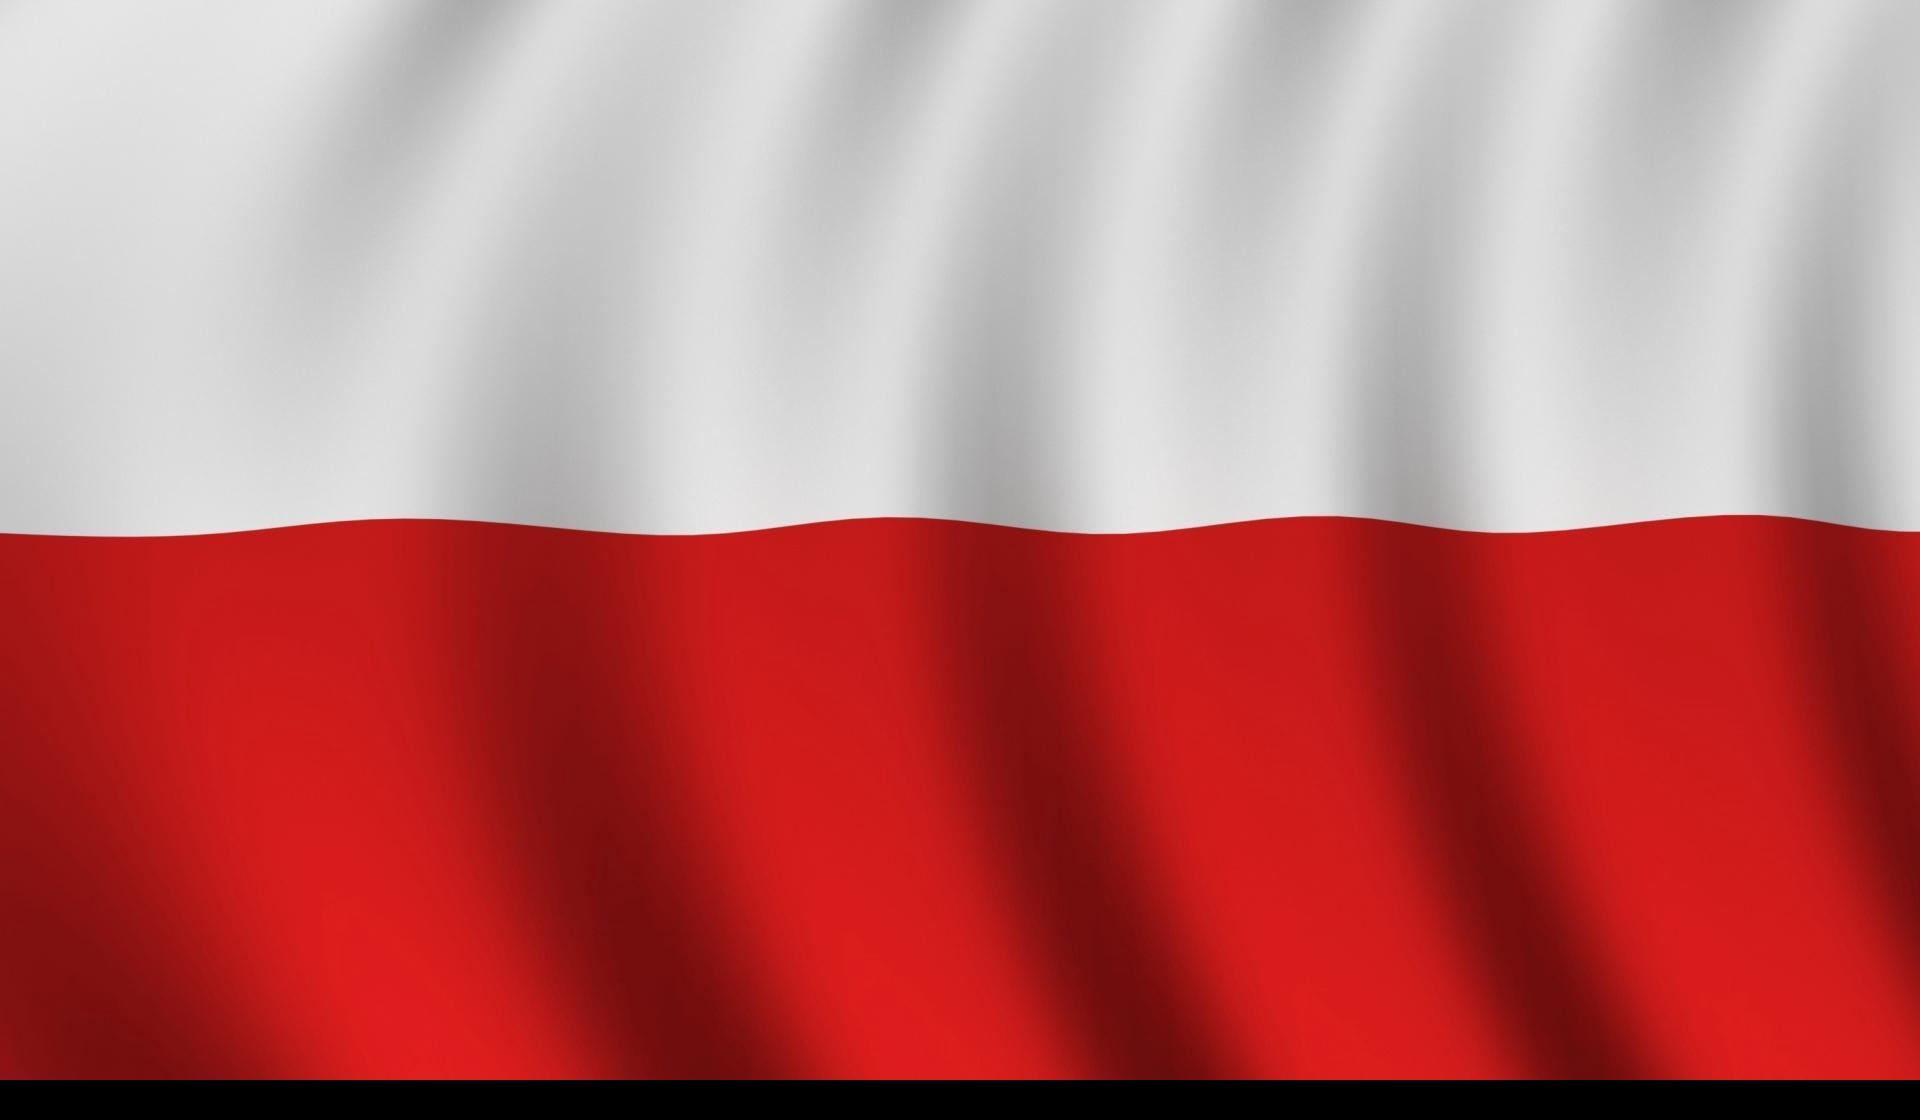 timage-552570-137-polska-x-3d-tapety-polska-flaga-1920-x-1080